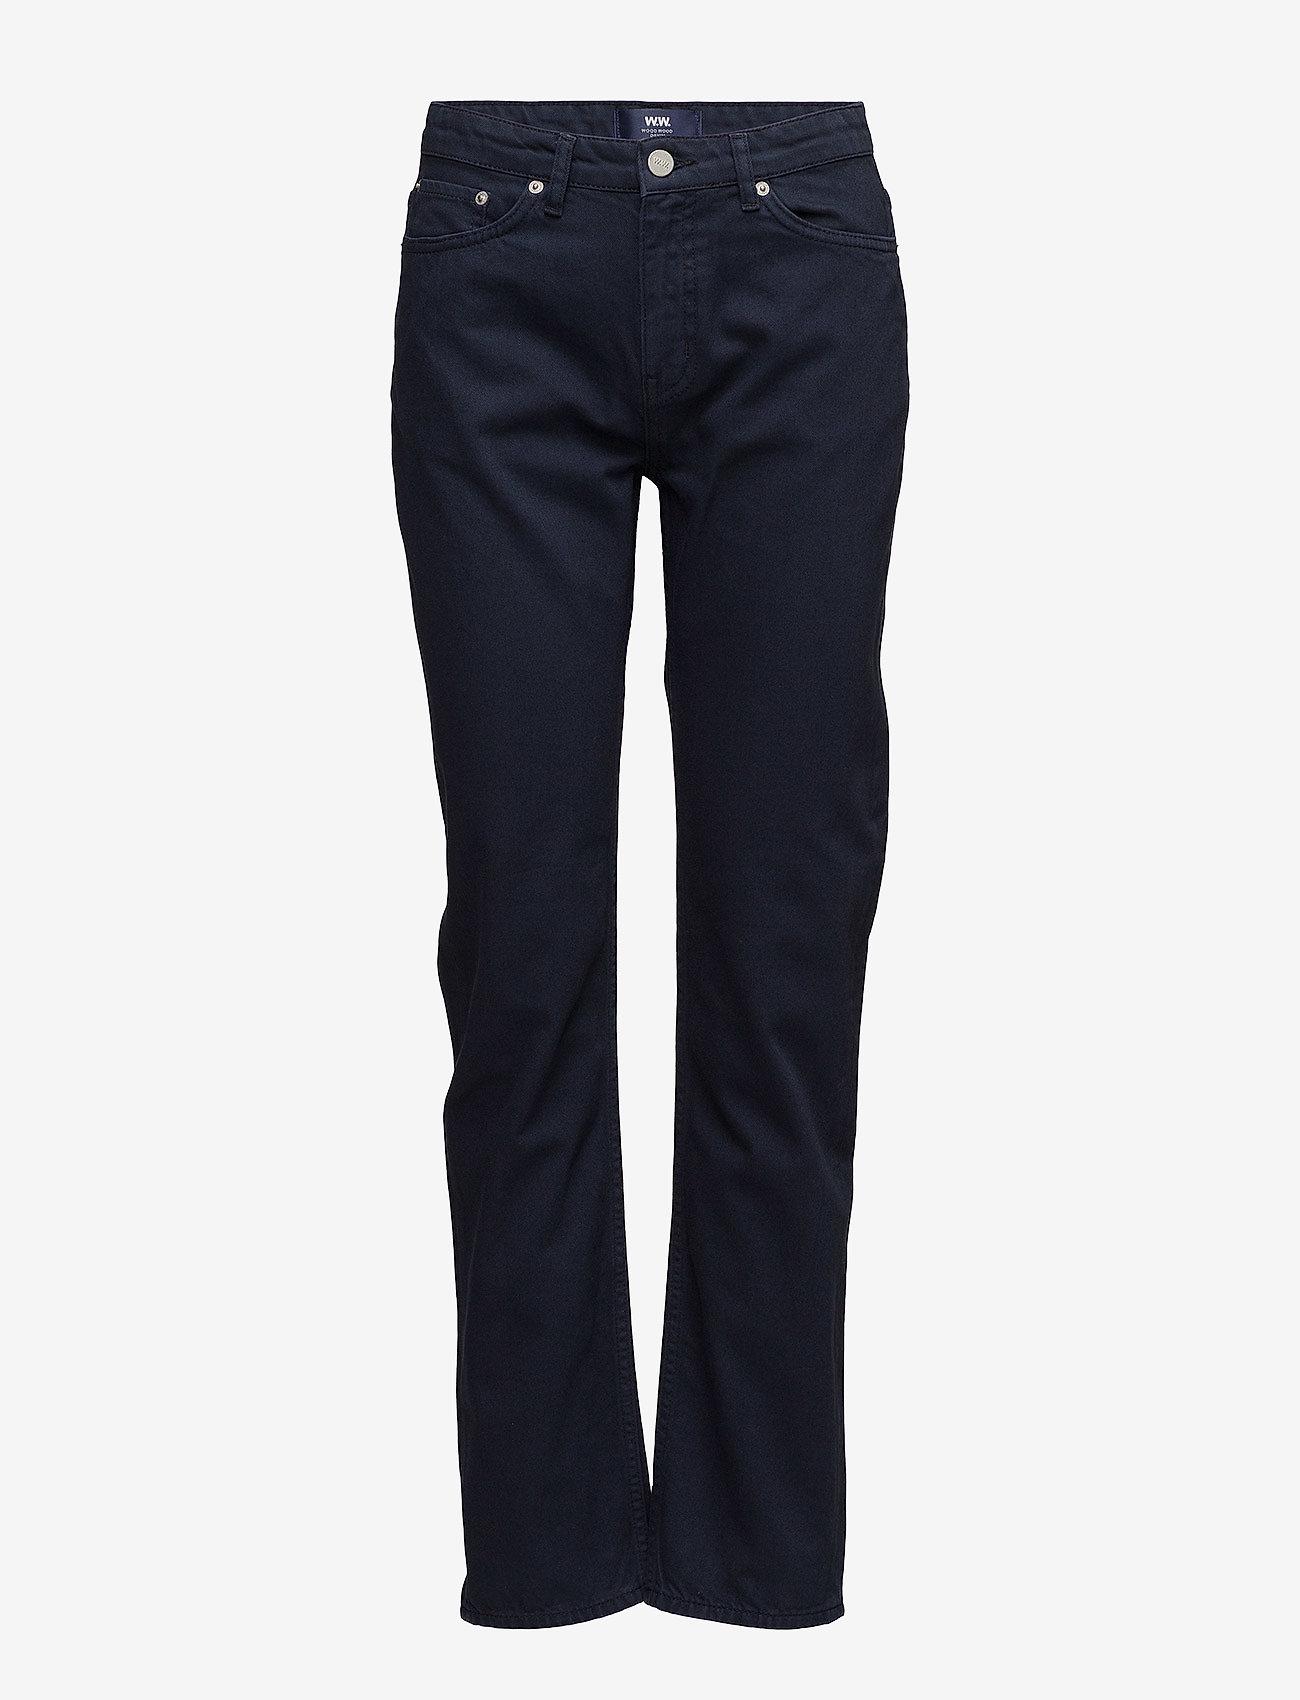 Wood Wood - Ina jeans - straight jeans - dark blue